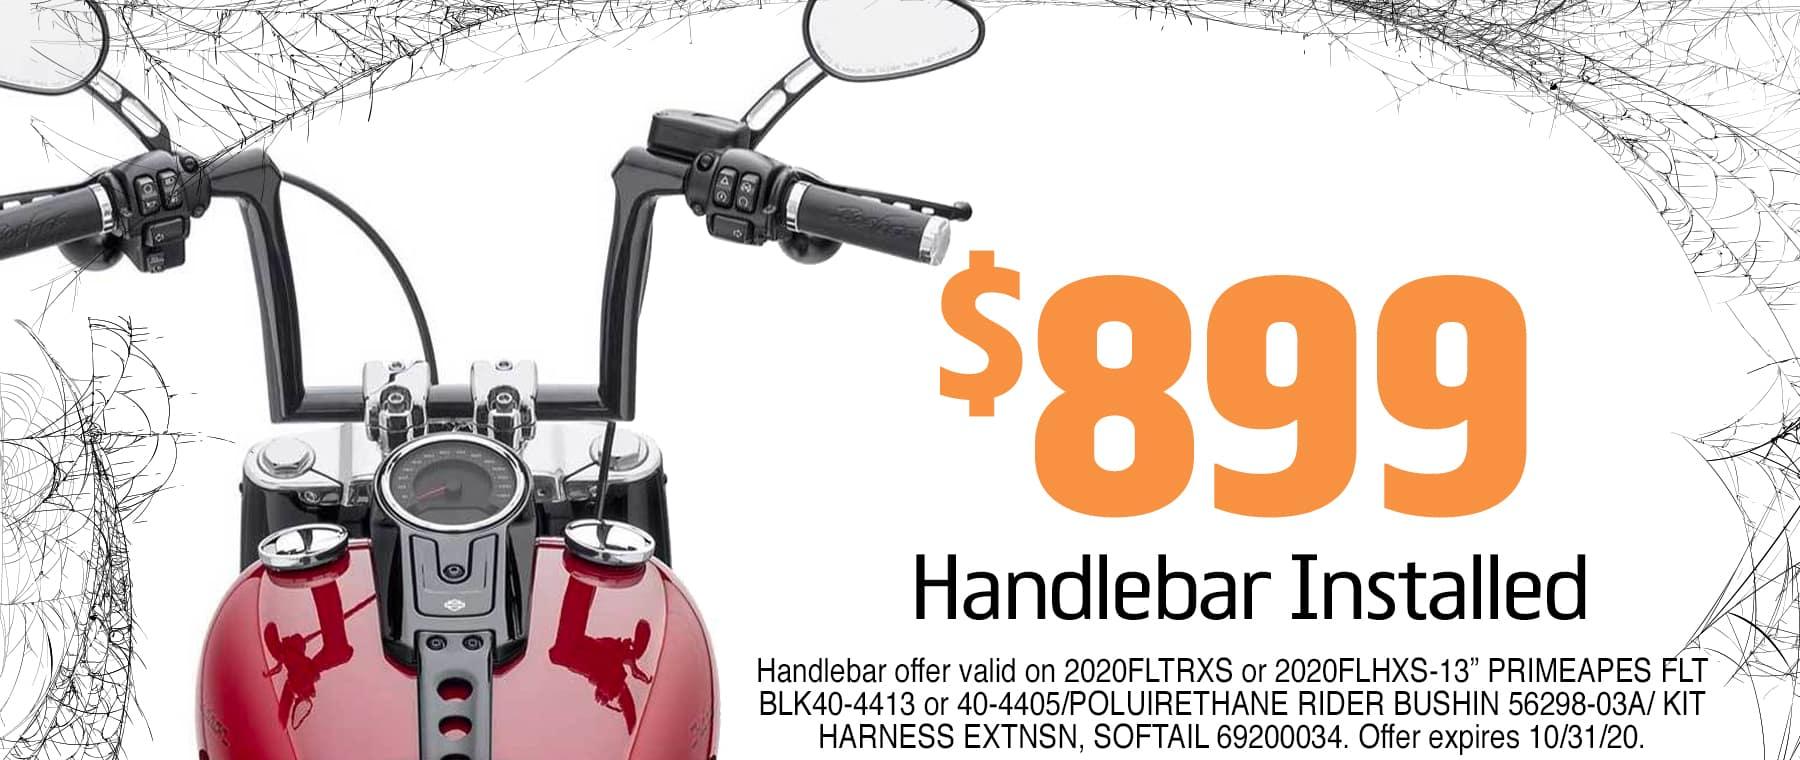 Handlebar Installation at Lakeland Harley-Davidson